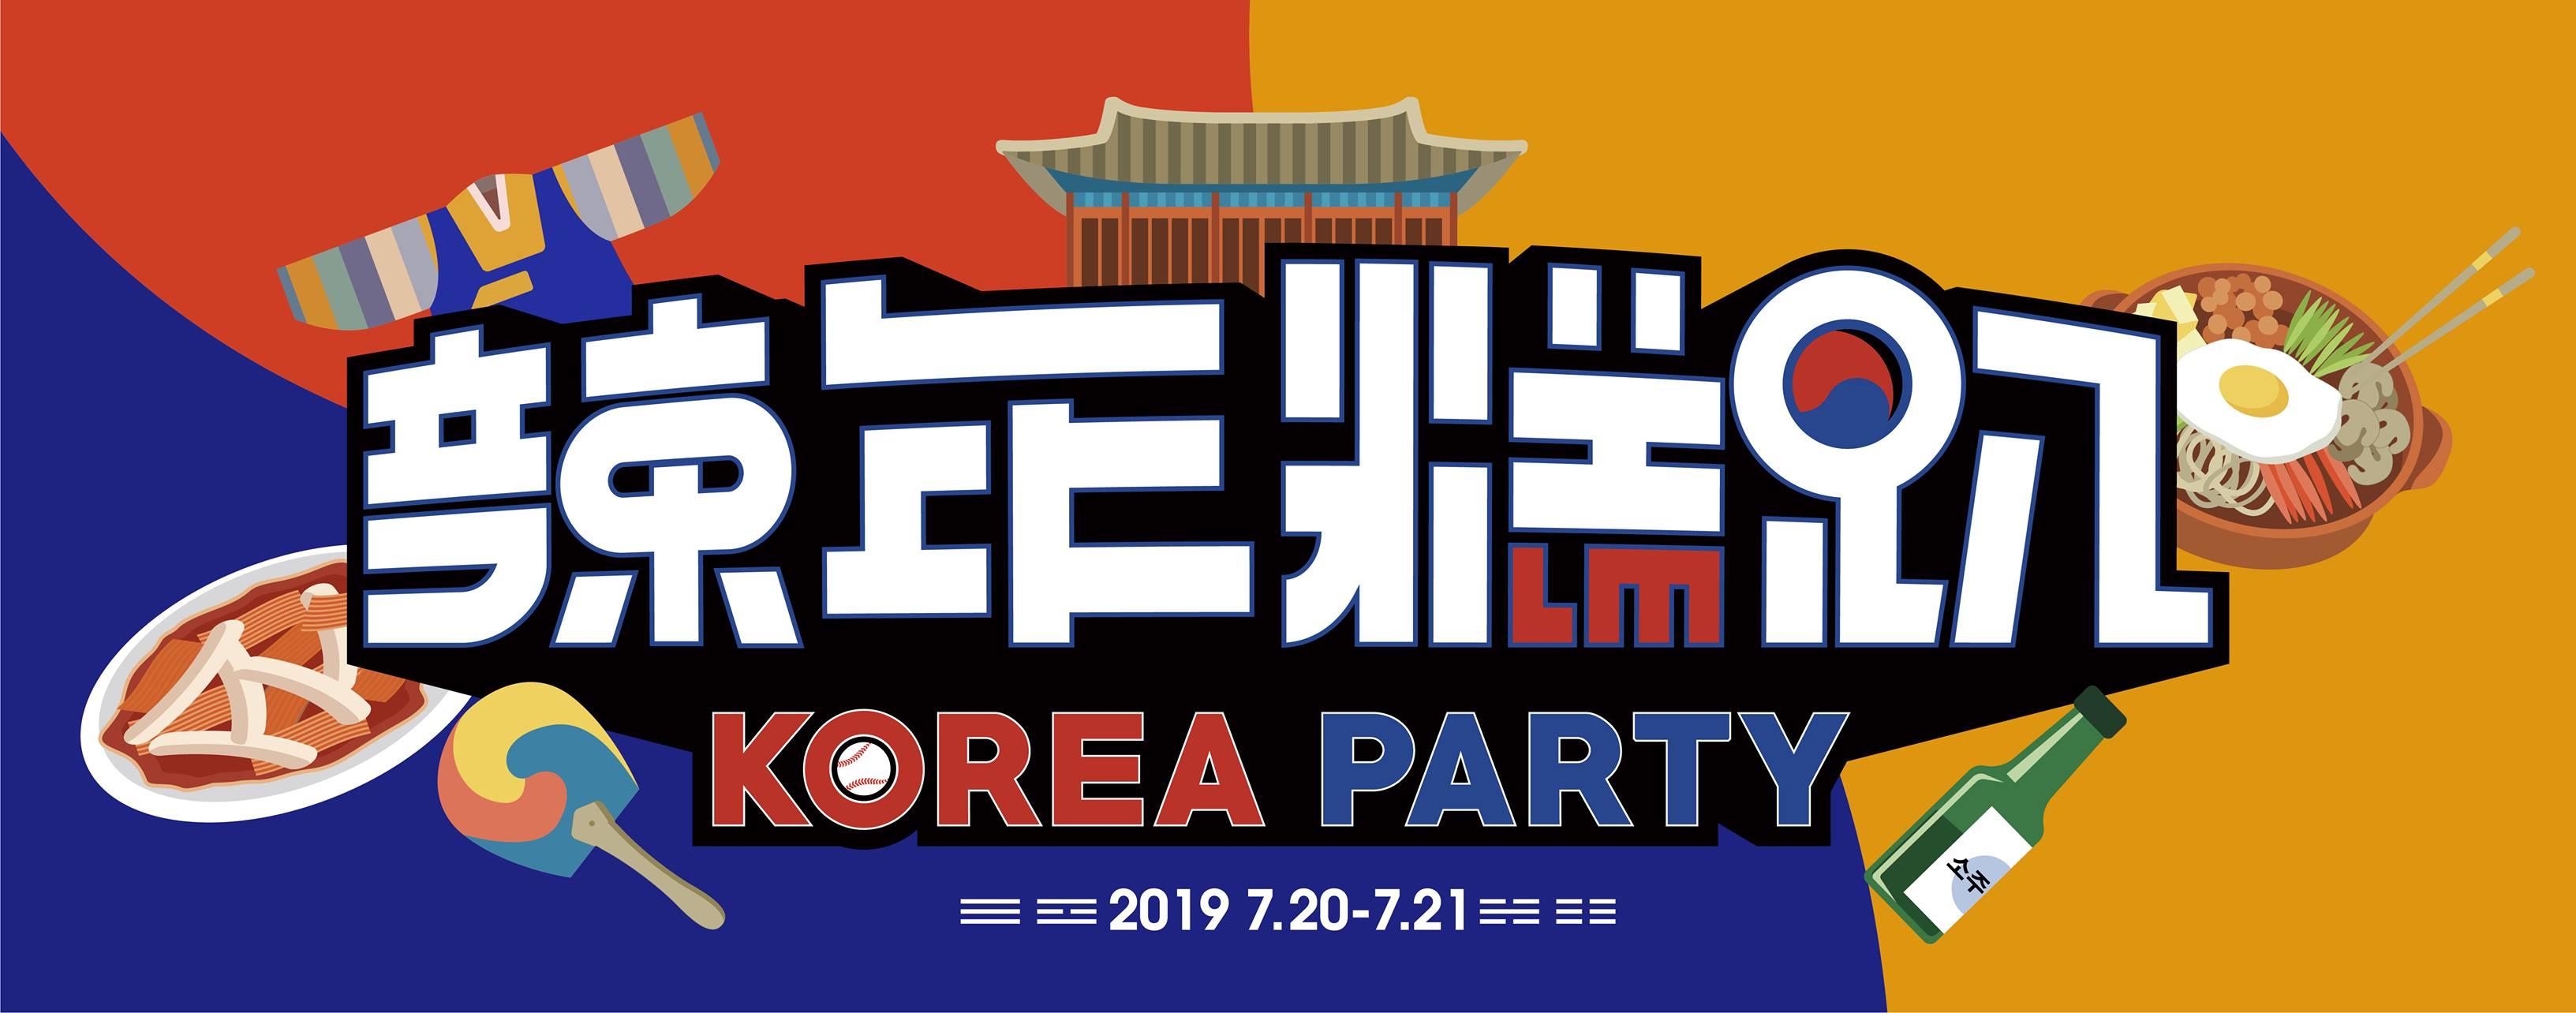 CPBL》Lamigo桃猿主題日辣年糕趴,韓風席捲全猿主場